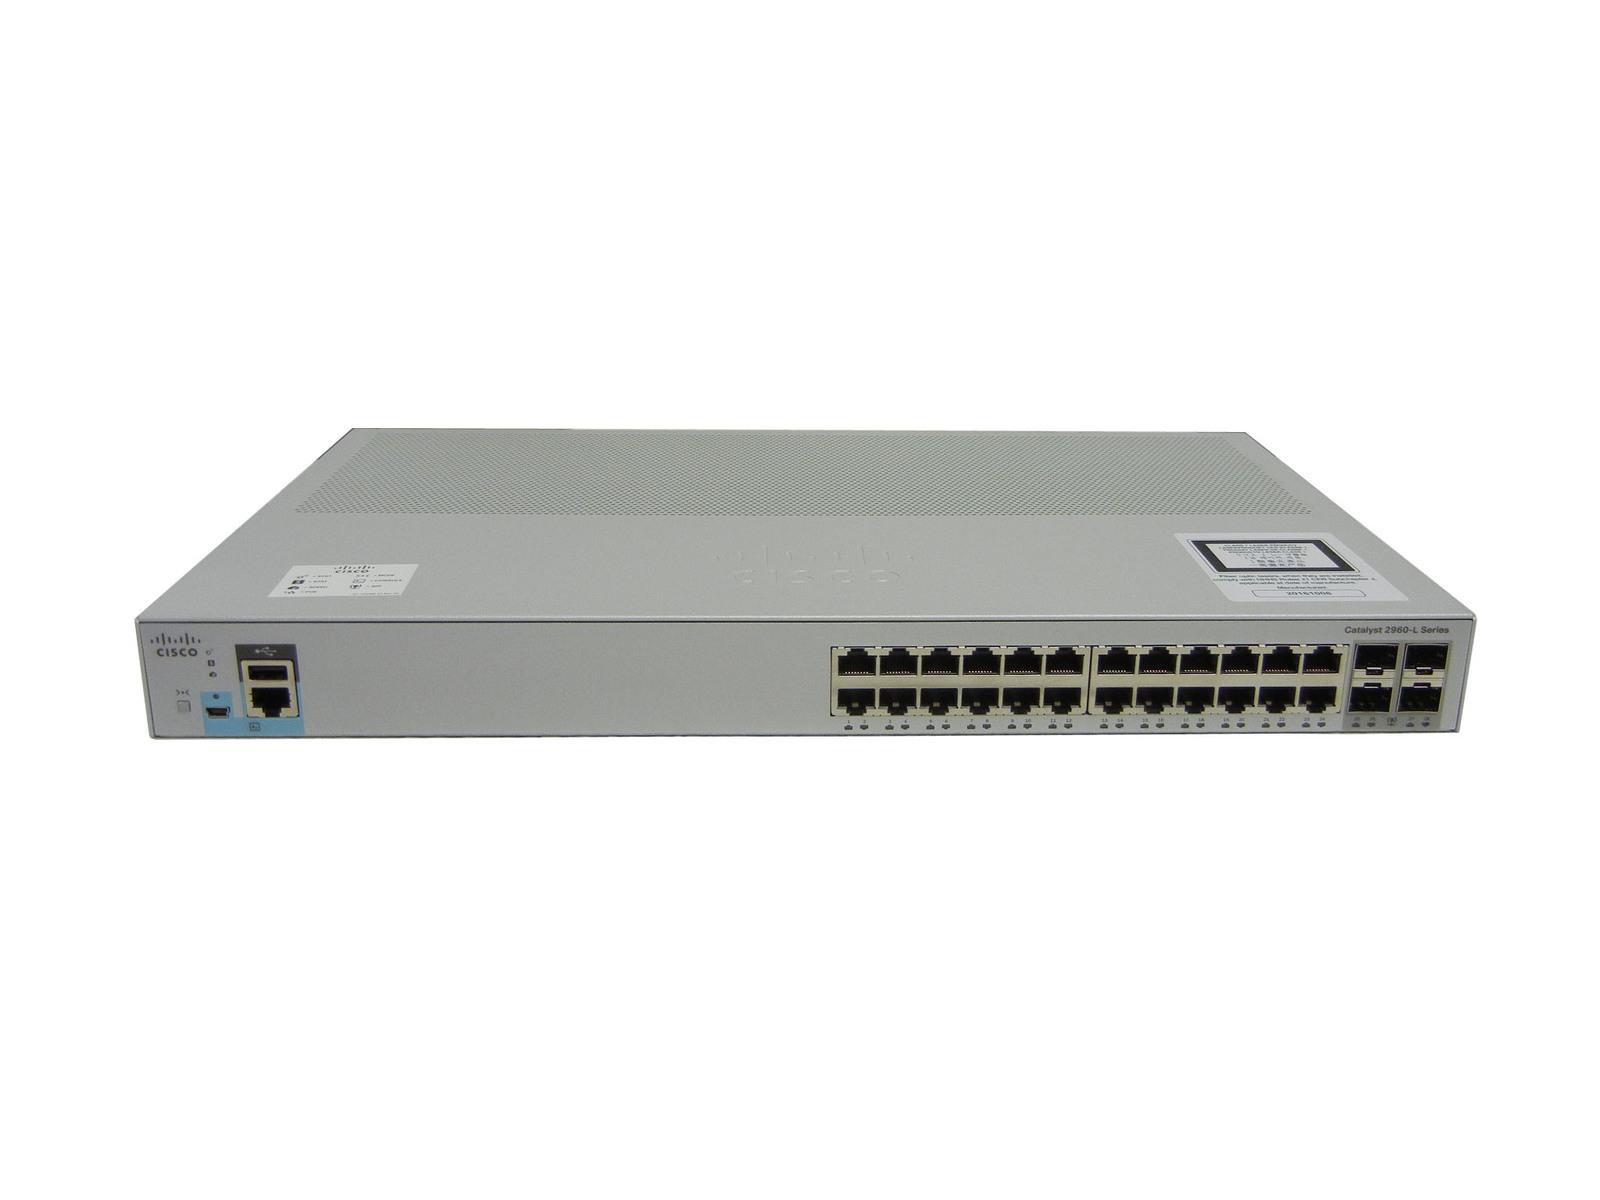 【中古 Catalyst】Cisco【中古】Cisco Catalyst 2960L-24TS-LL (WS-C2960L-24TS-LL) (WS-C2960L-24TS-LL), プティフラン:65895d4e --- officewill.xsrv.jp